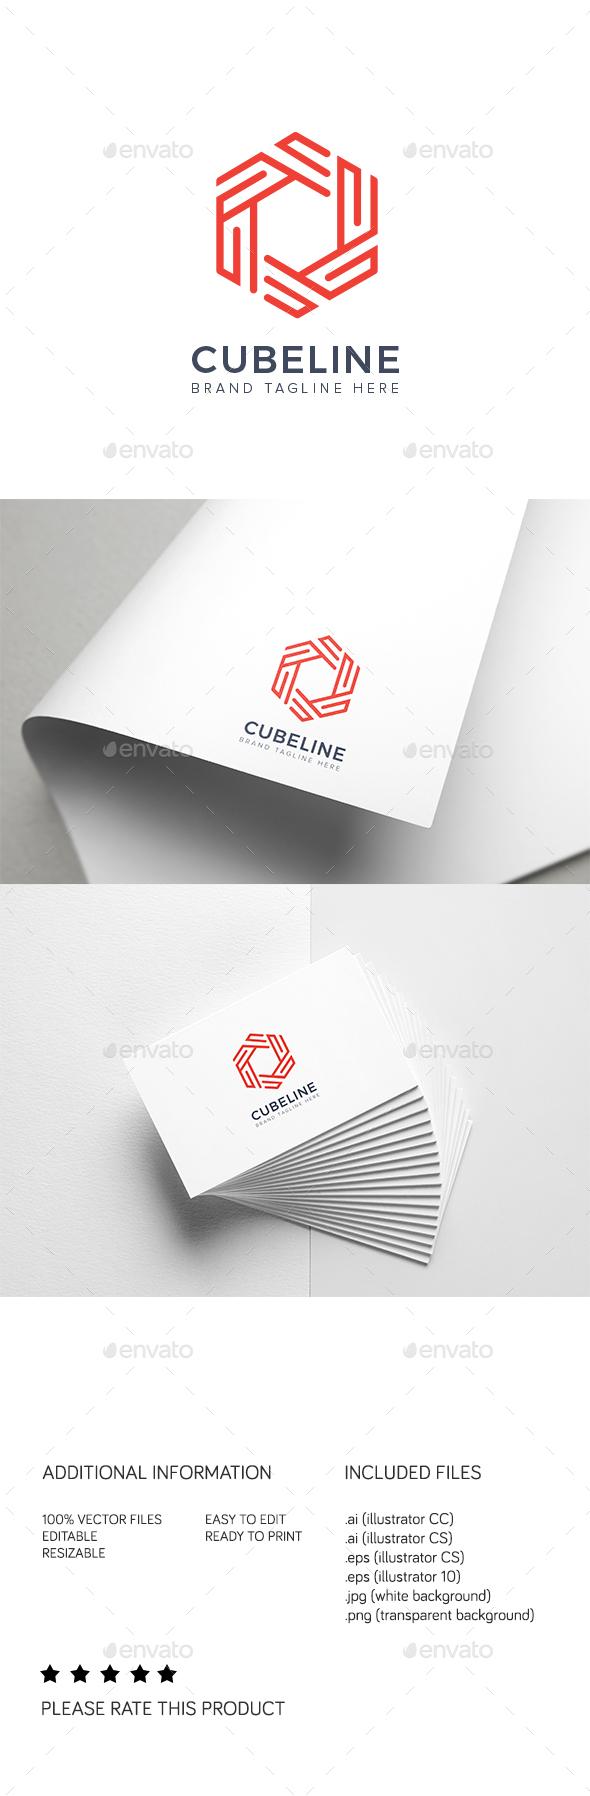 Cubeline Logo